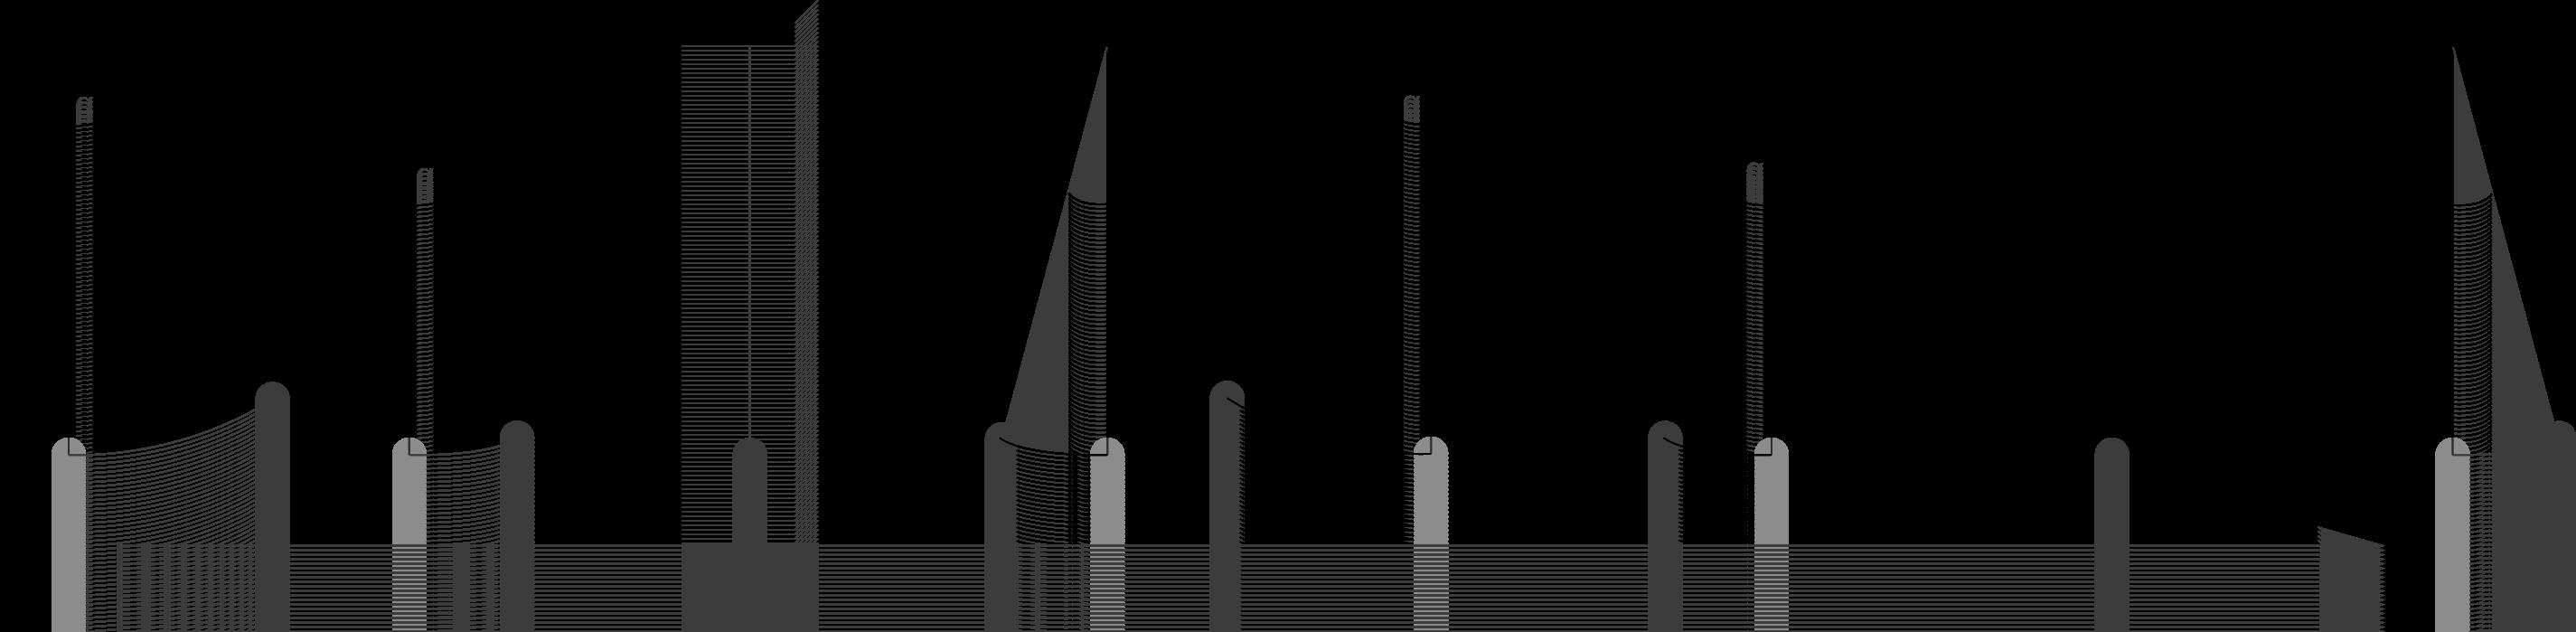 Mechanische Schwingungen: Mathematisches Pendel